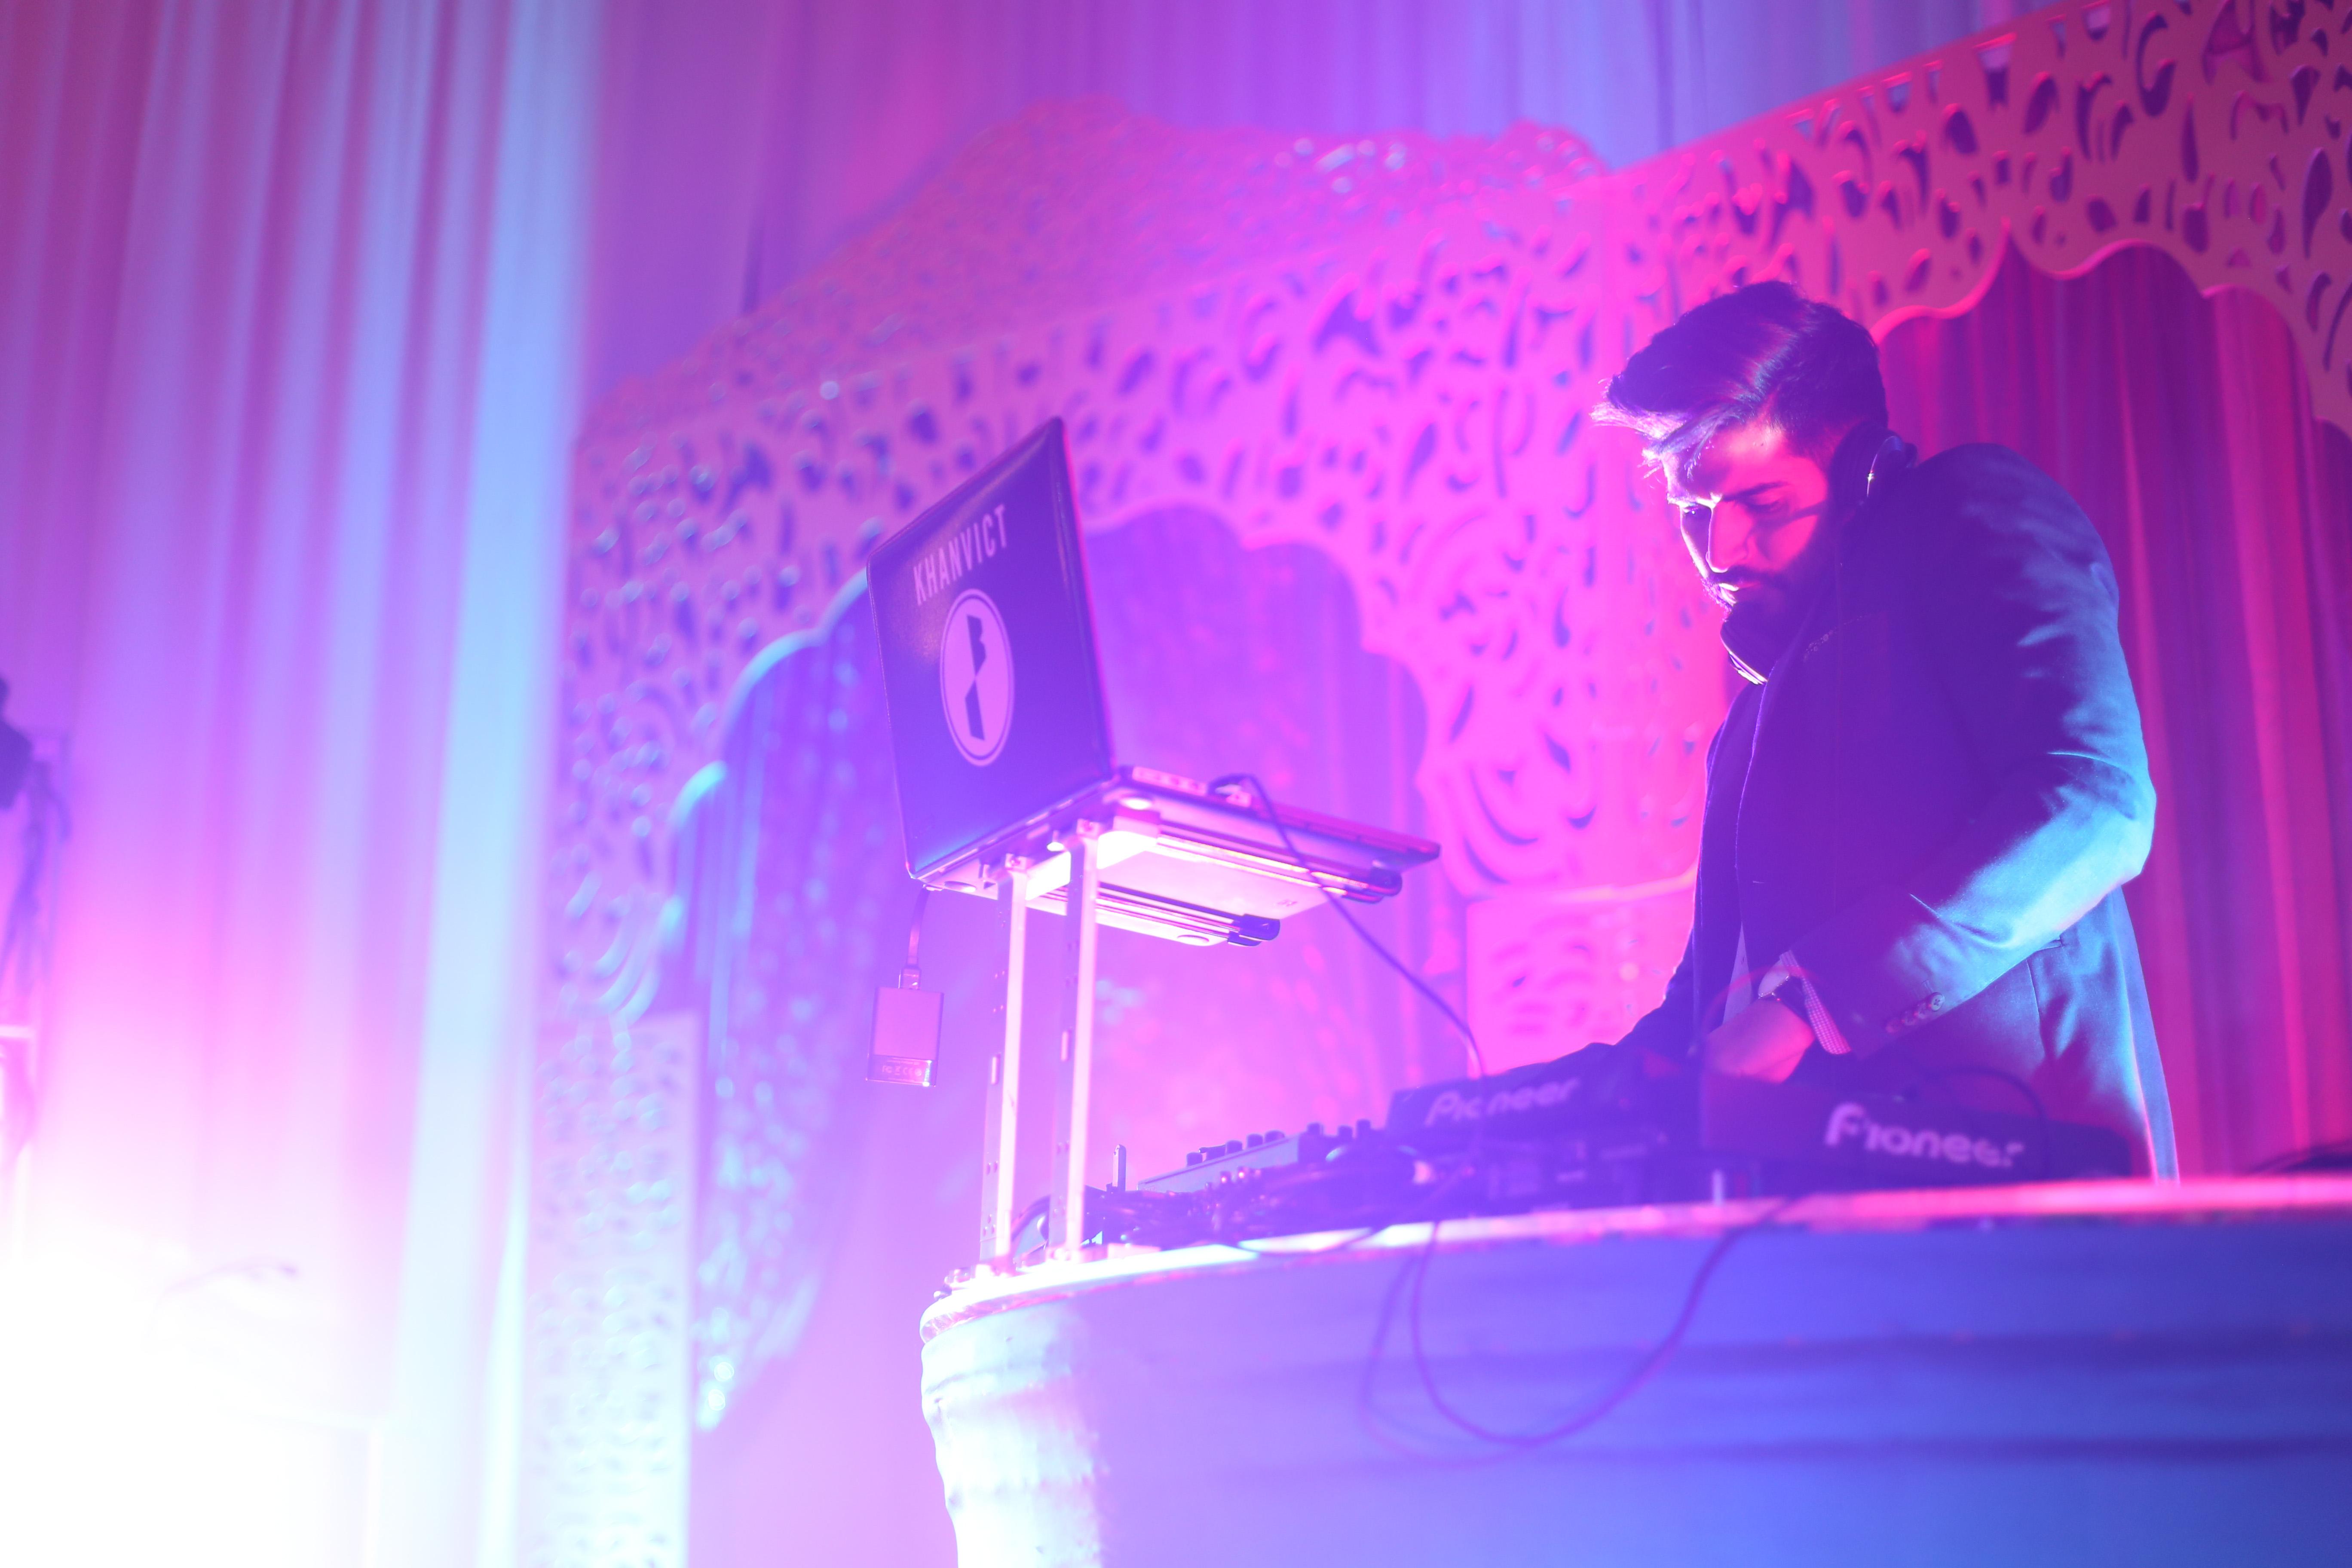 DJ_Khanvict_(1).jpg